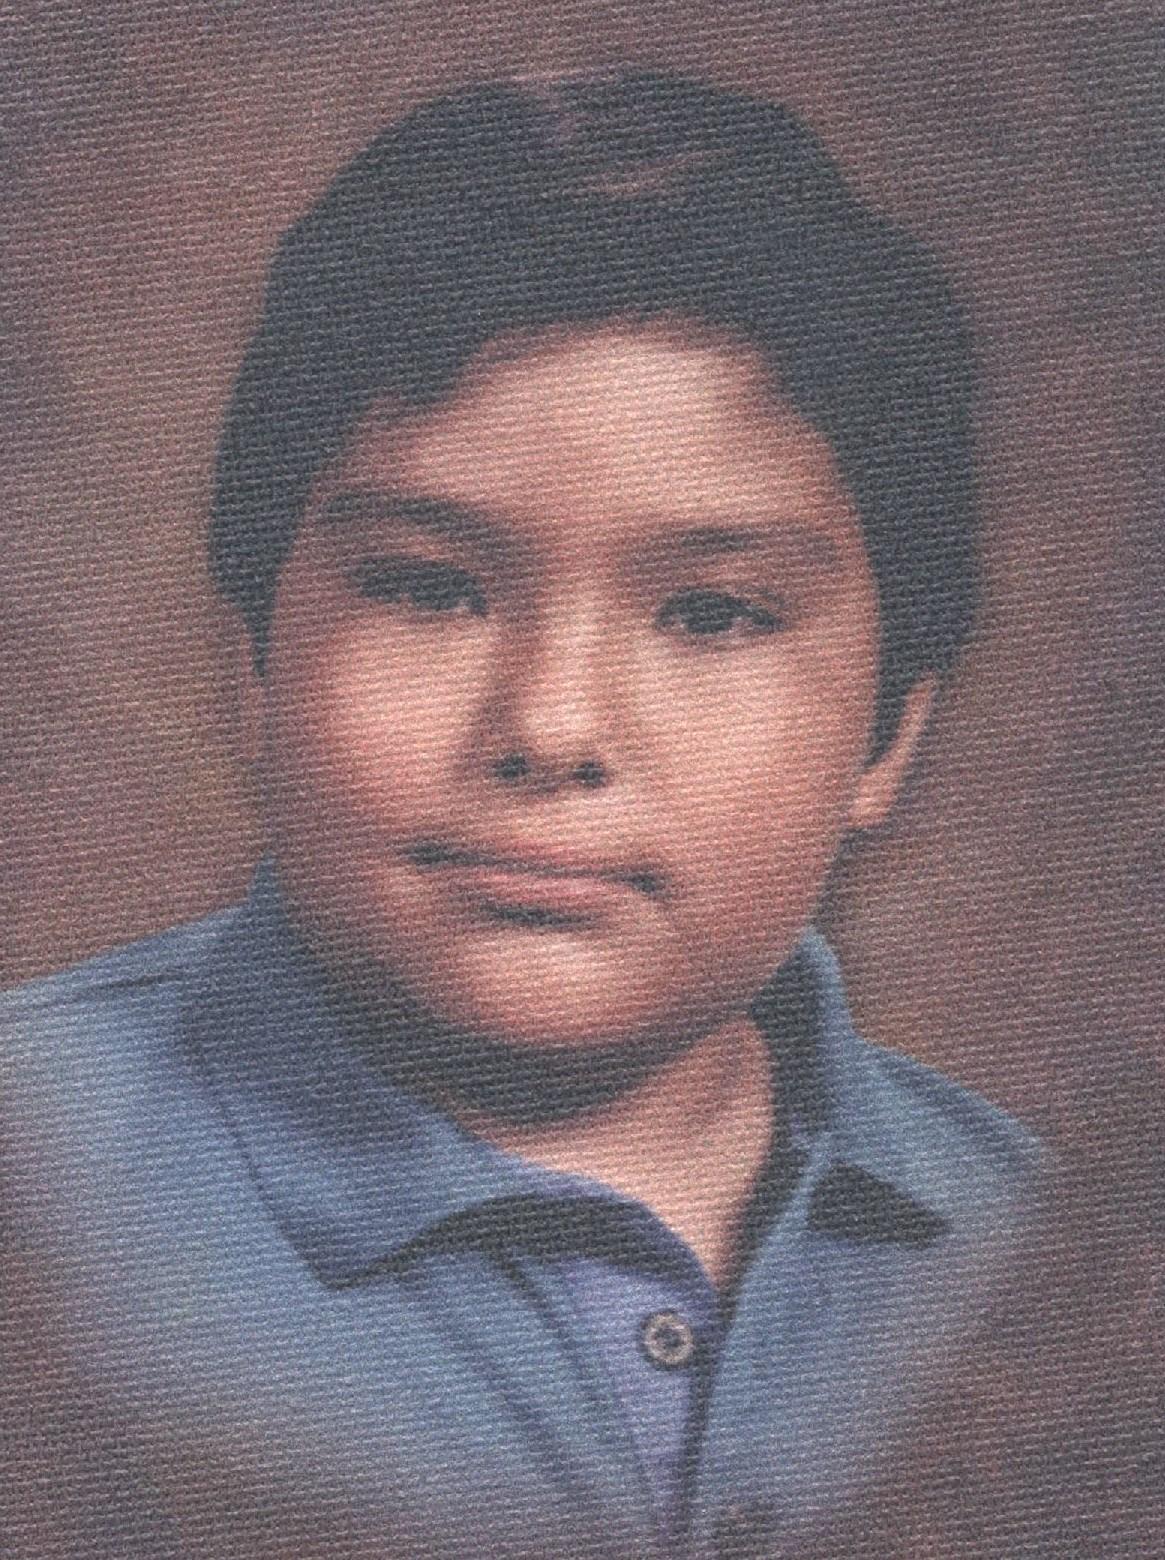 Jesus  Arroyo